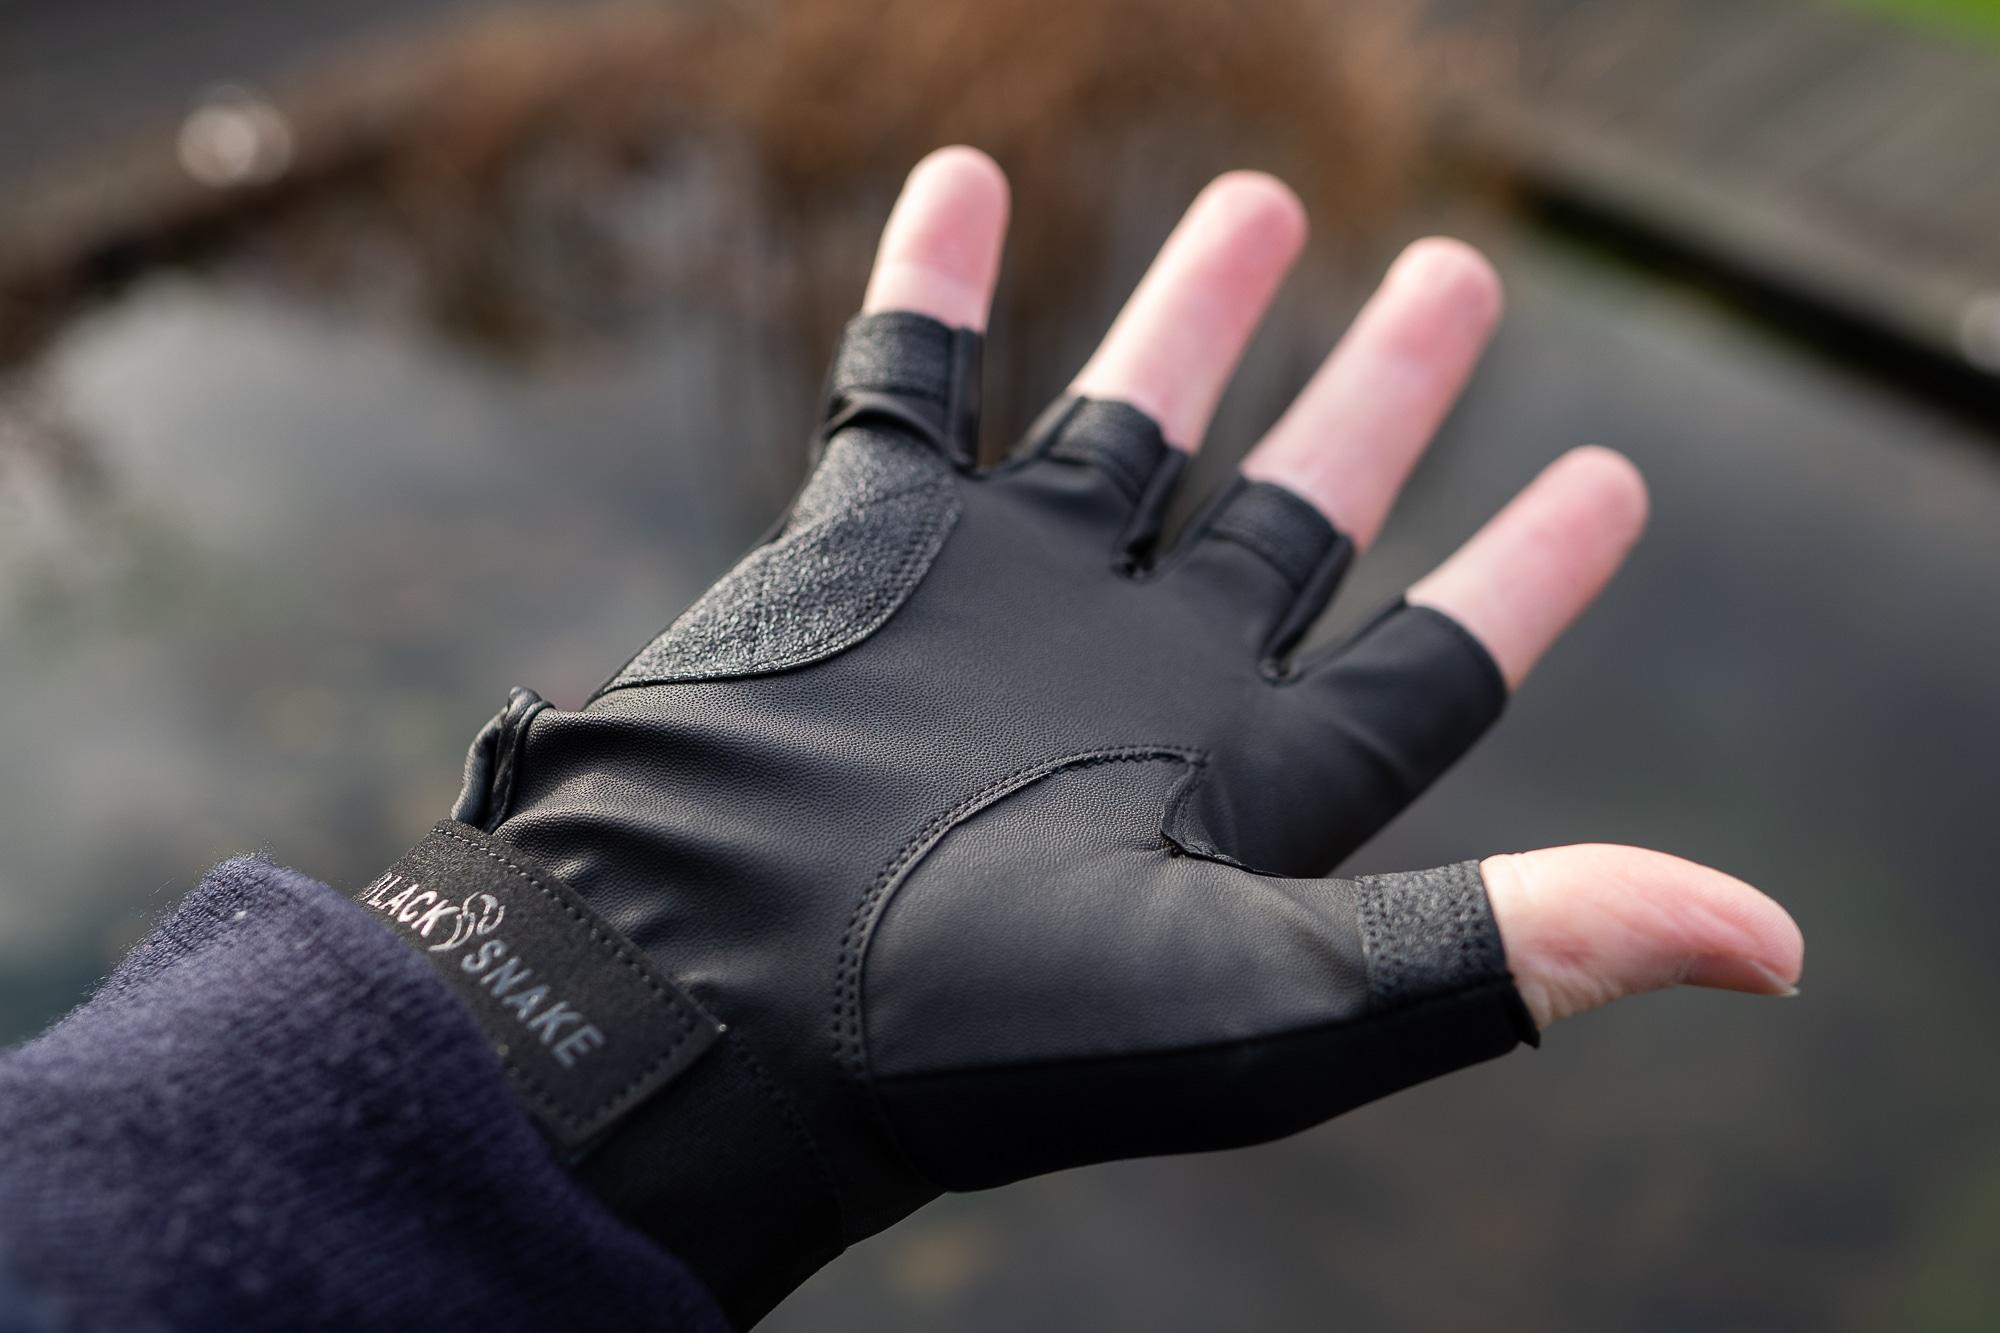 ICEBEHR Titanium Neopren Angel Handschuhe Winterhandschuhe Angelhandschuhe Jagd